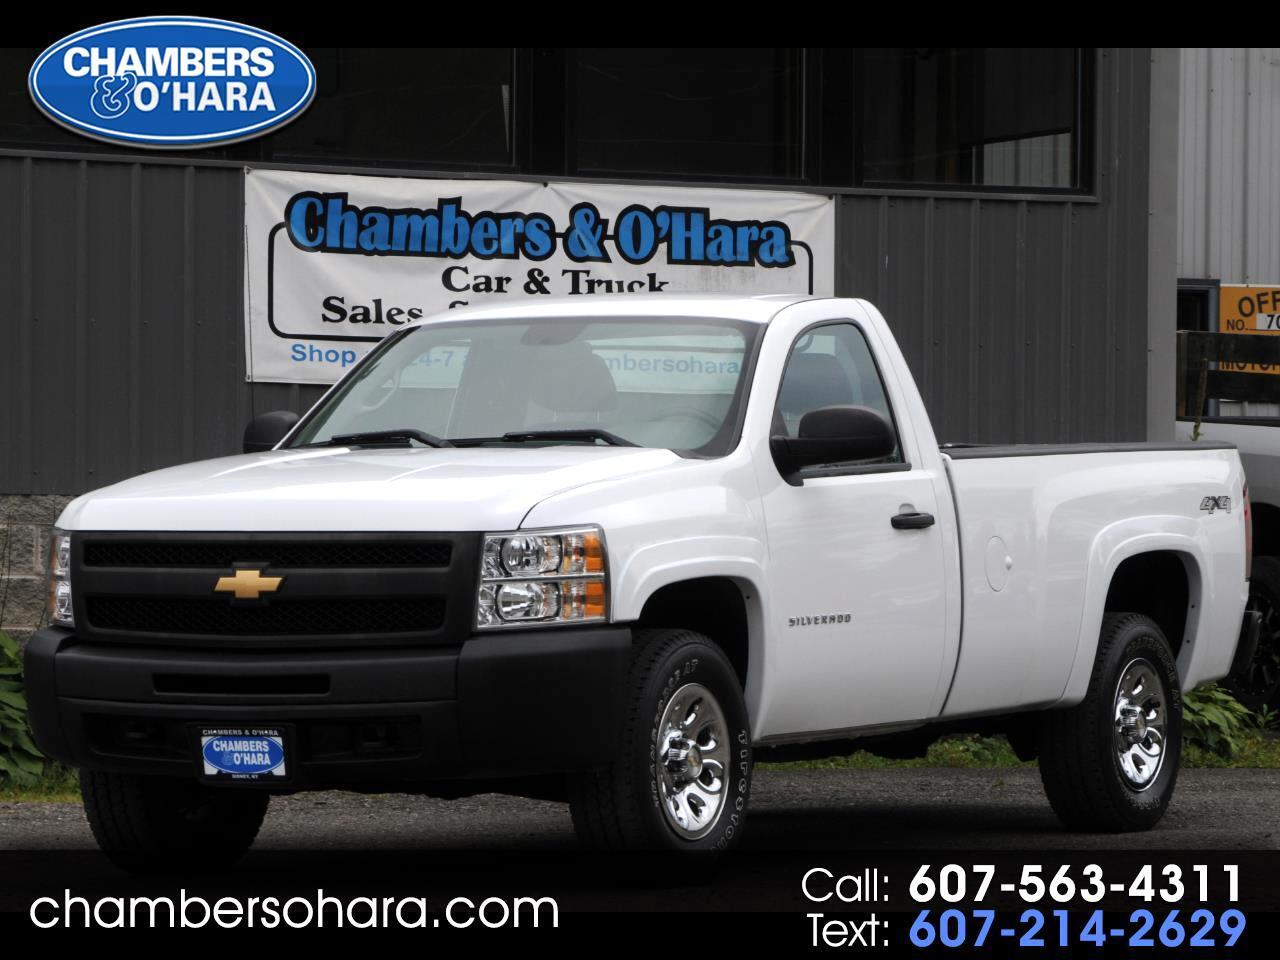 2013 Chevrolet Silverado 1500 Work Truck Long Box 4WD